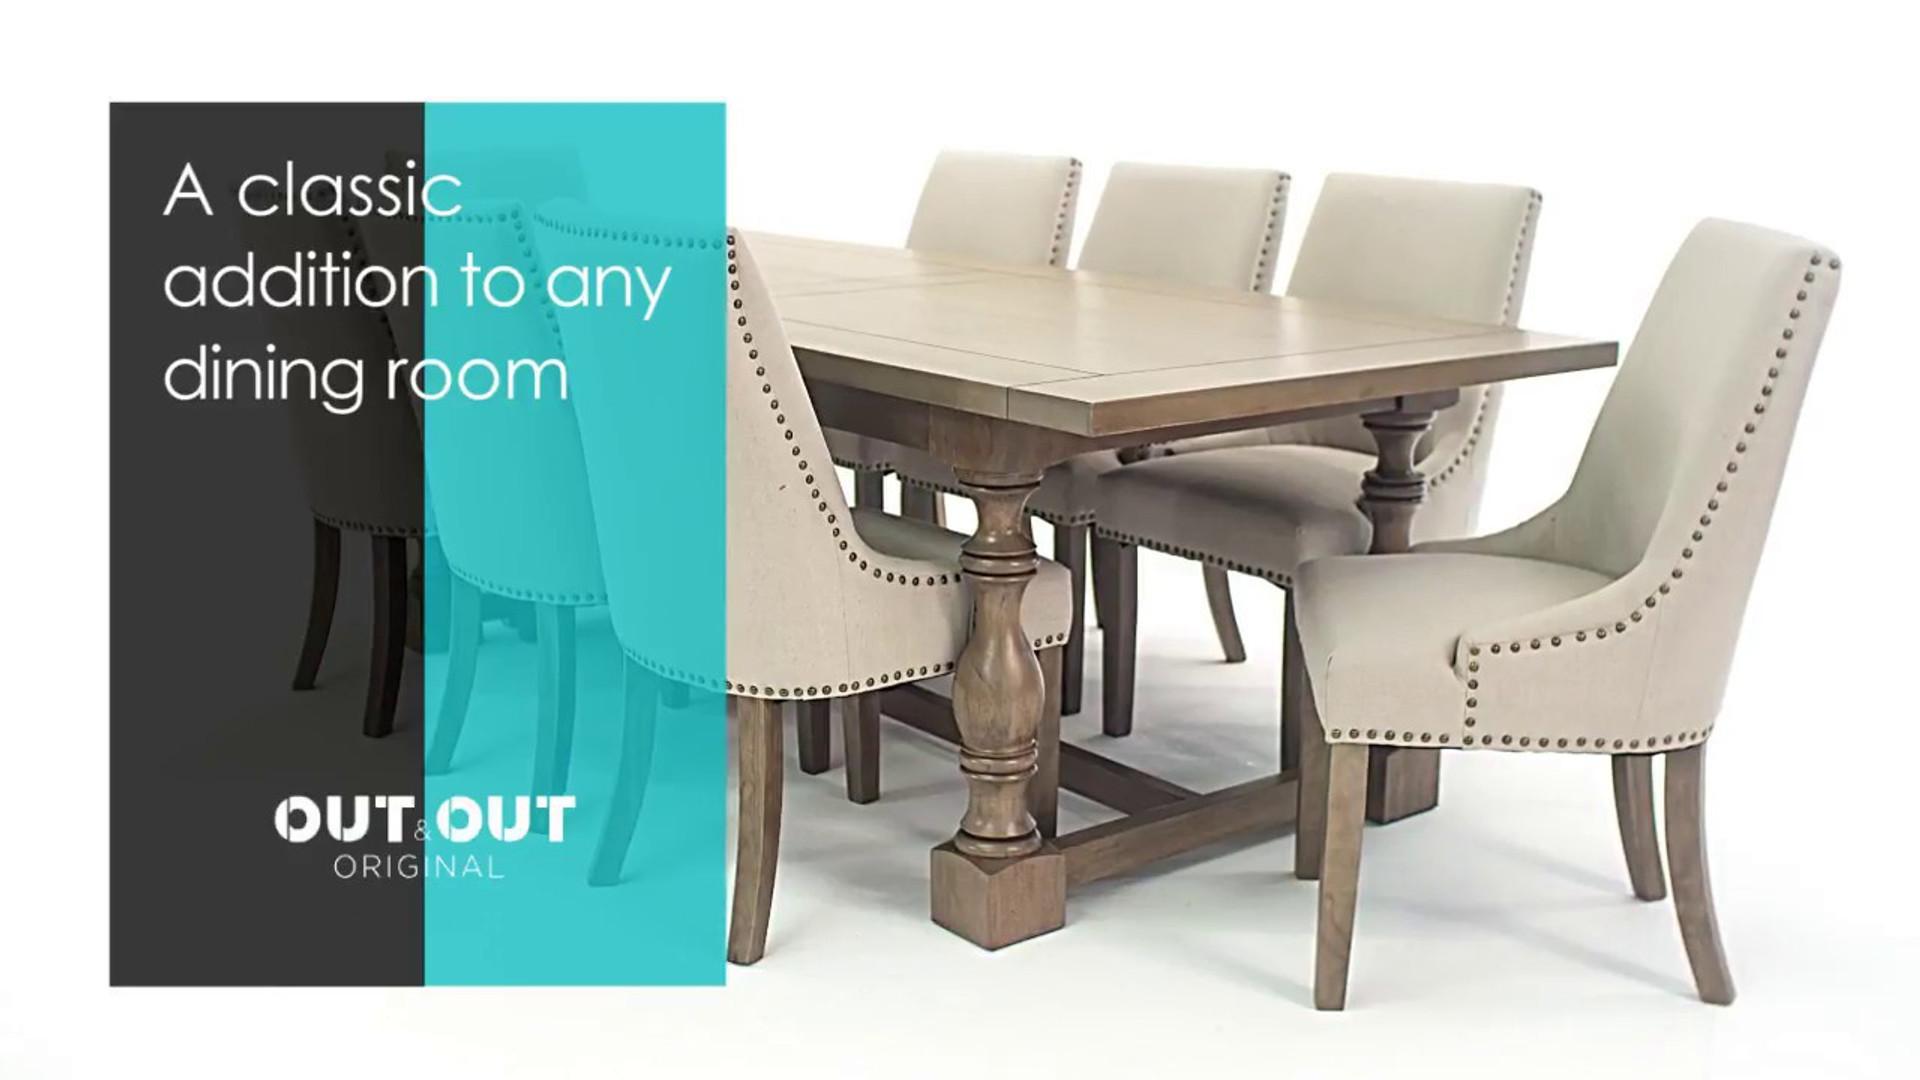 Rembrandt Table Set Advert